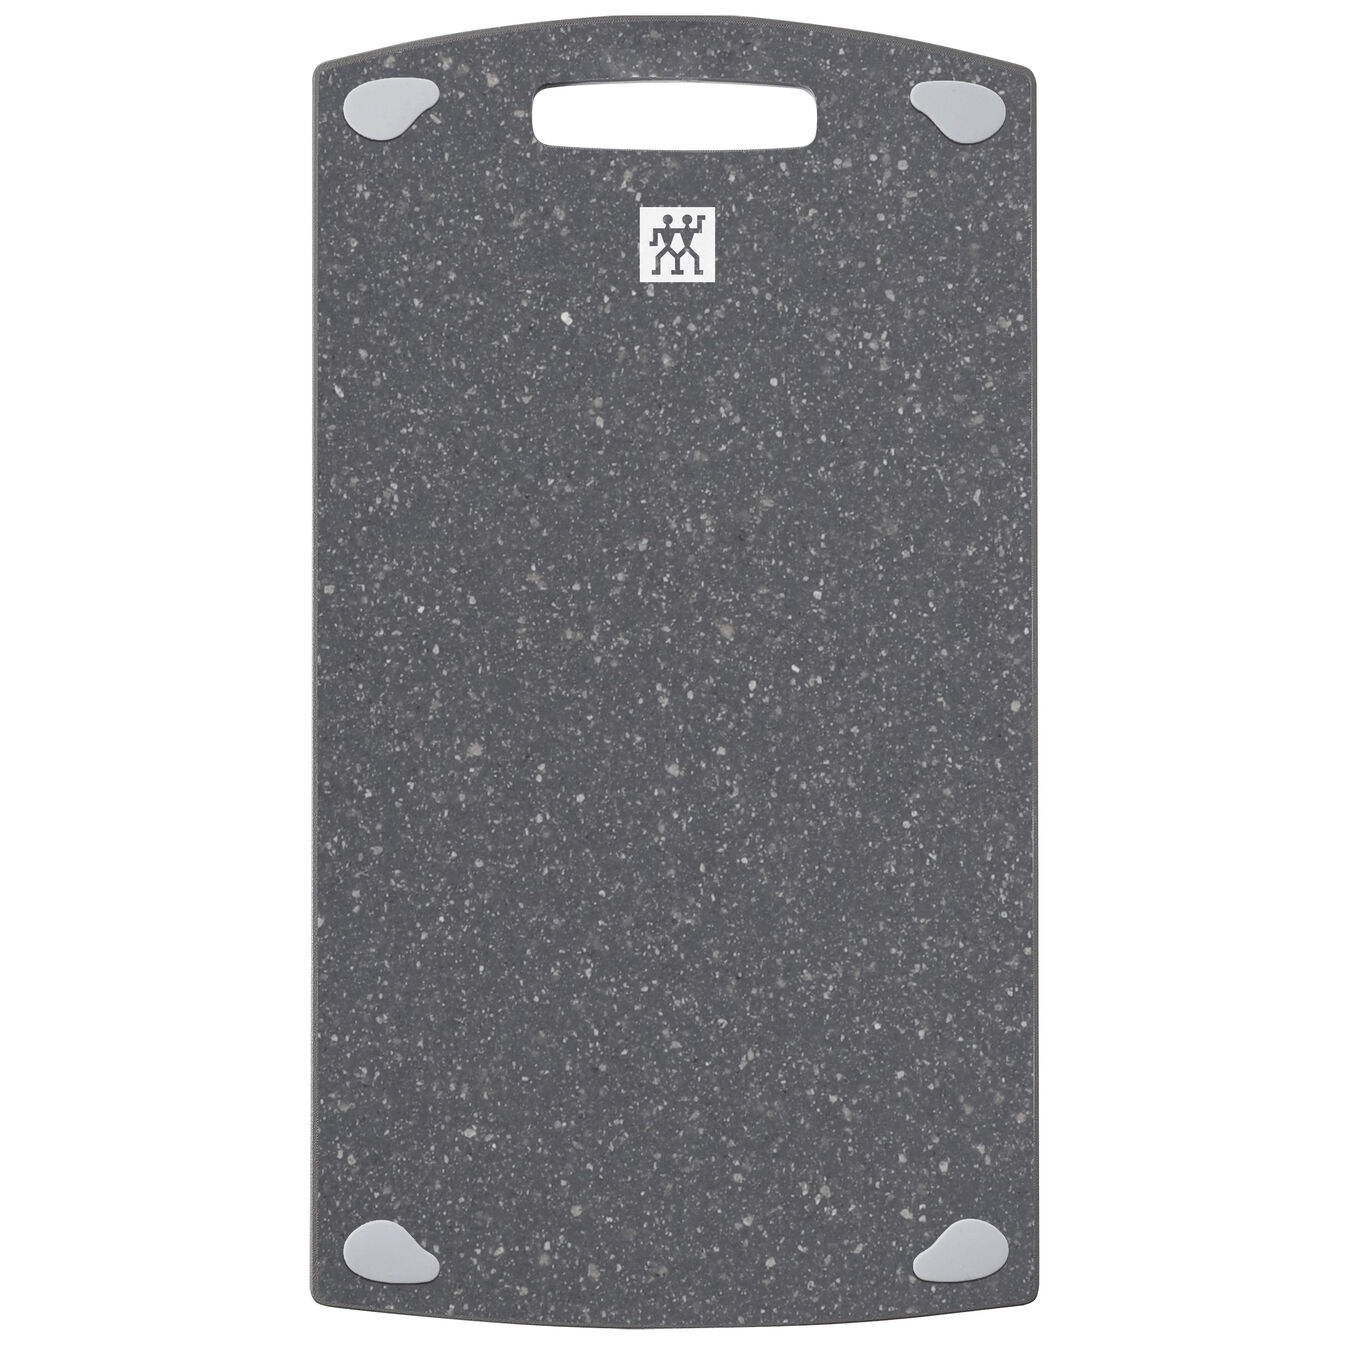 2 pc. Cutting board set, Plastic | 36 cm x 20 cm & 37 cm x 27 cm 36 cm x 20 cm Plastic,,large 6